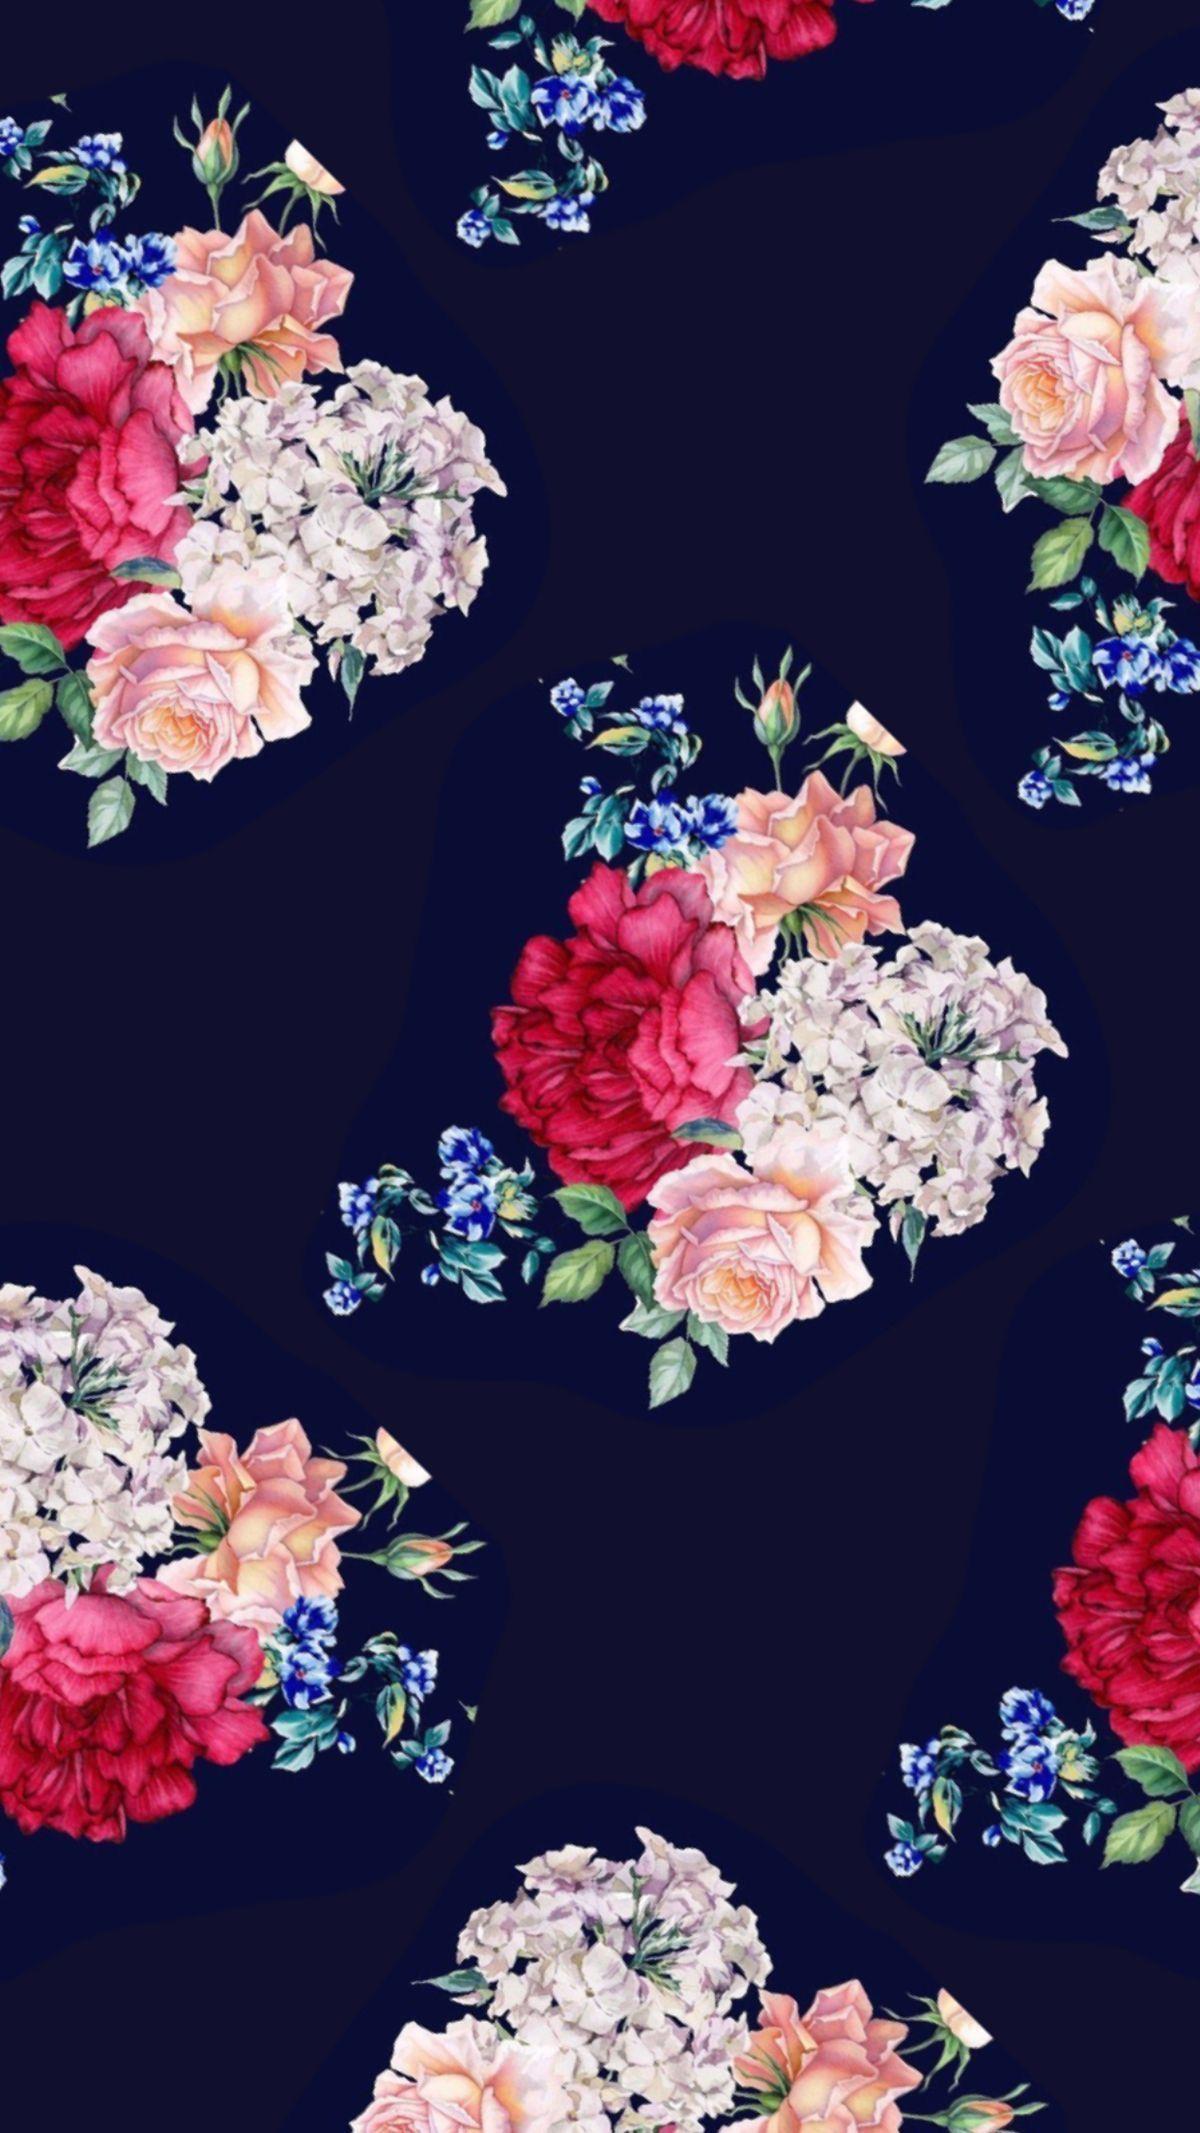 Asdadadad Flowery Wallpaper Flower Wallpaper Floral Wallpaper Iphone